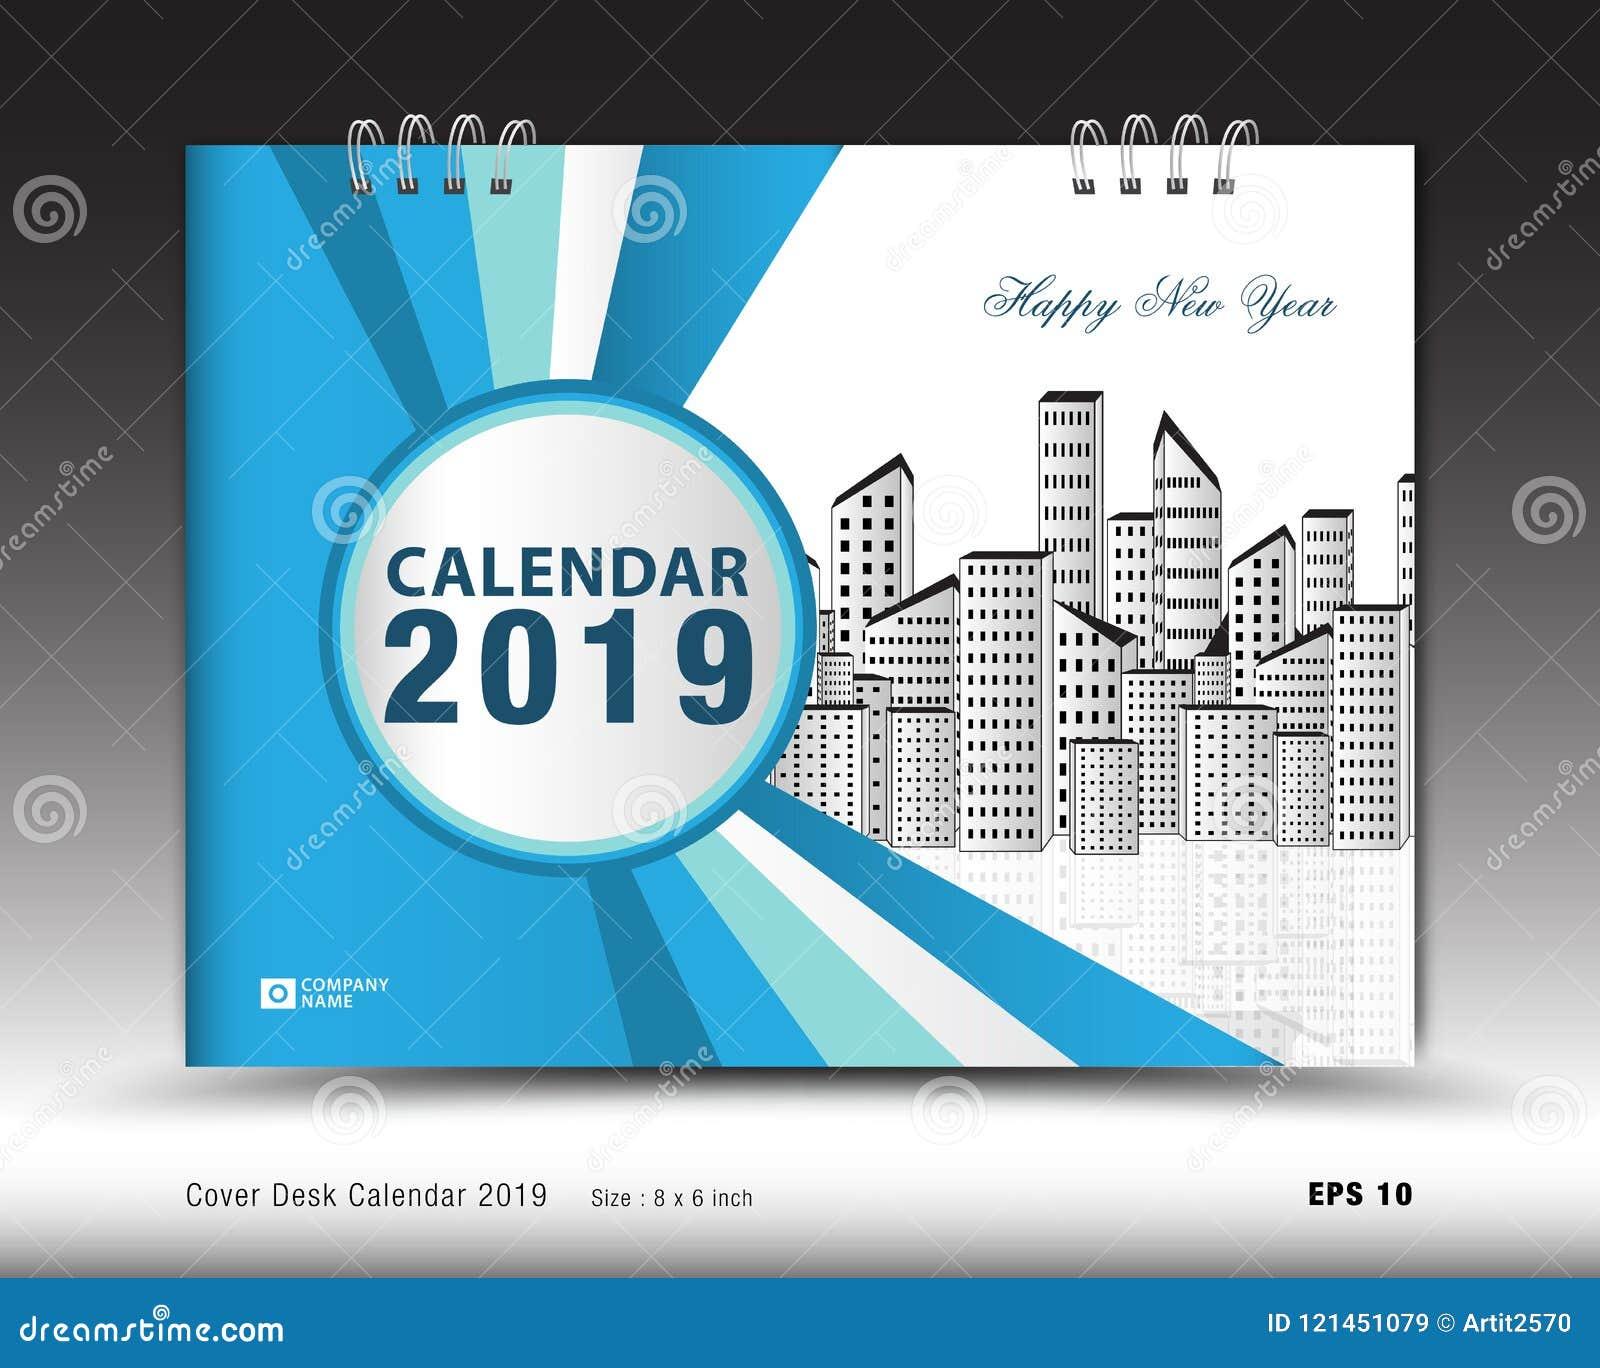 35 Best Magazine Template Designs 2019: Cover Desk Calendar For 2019 Year Template Vector, Book